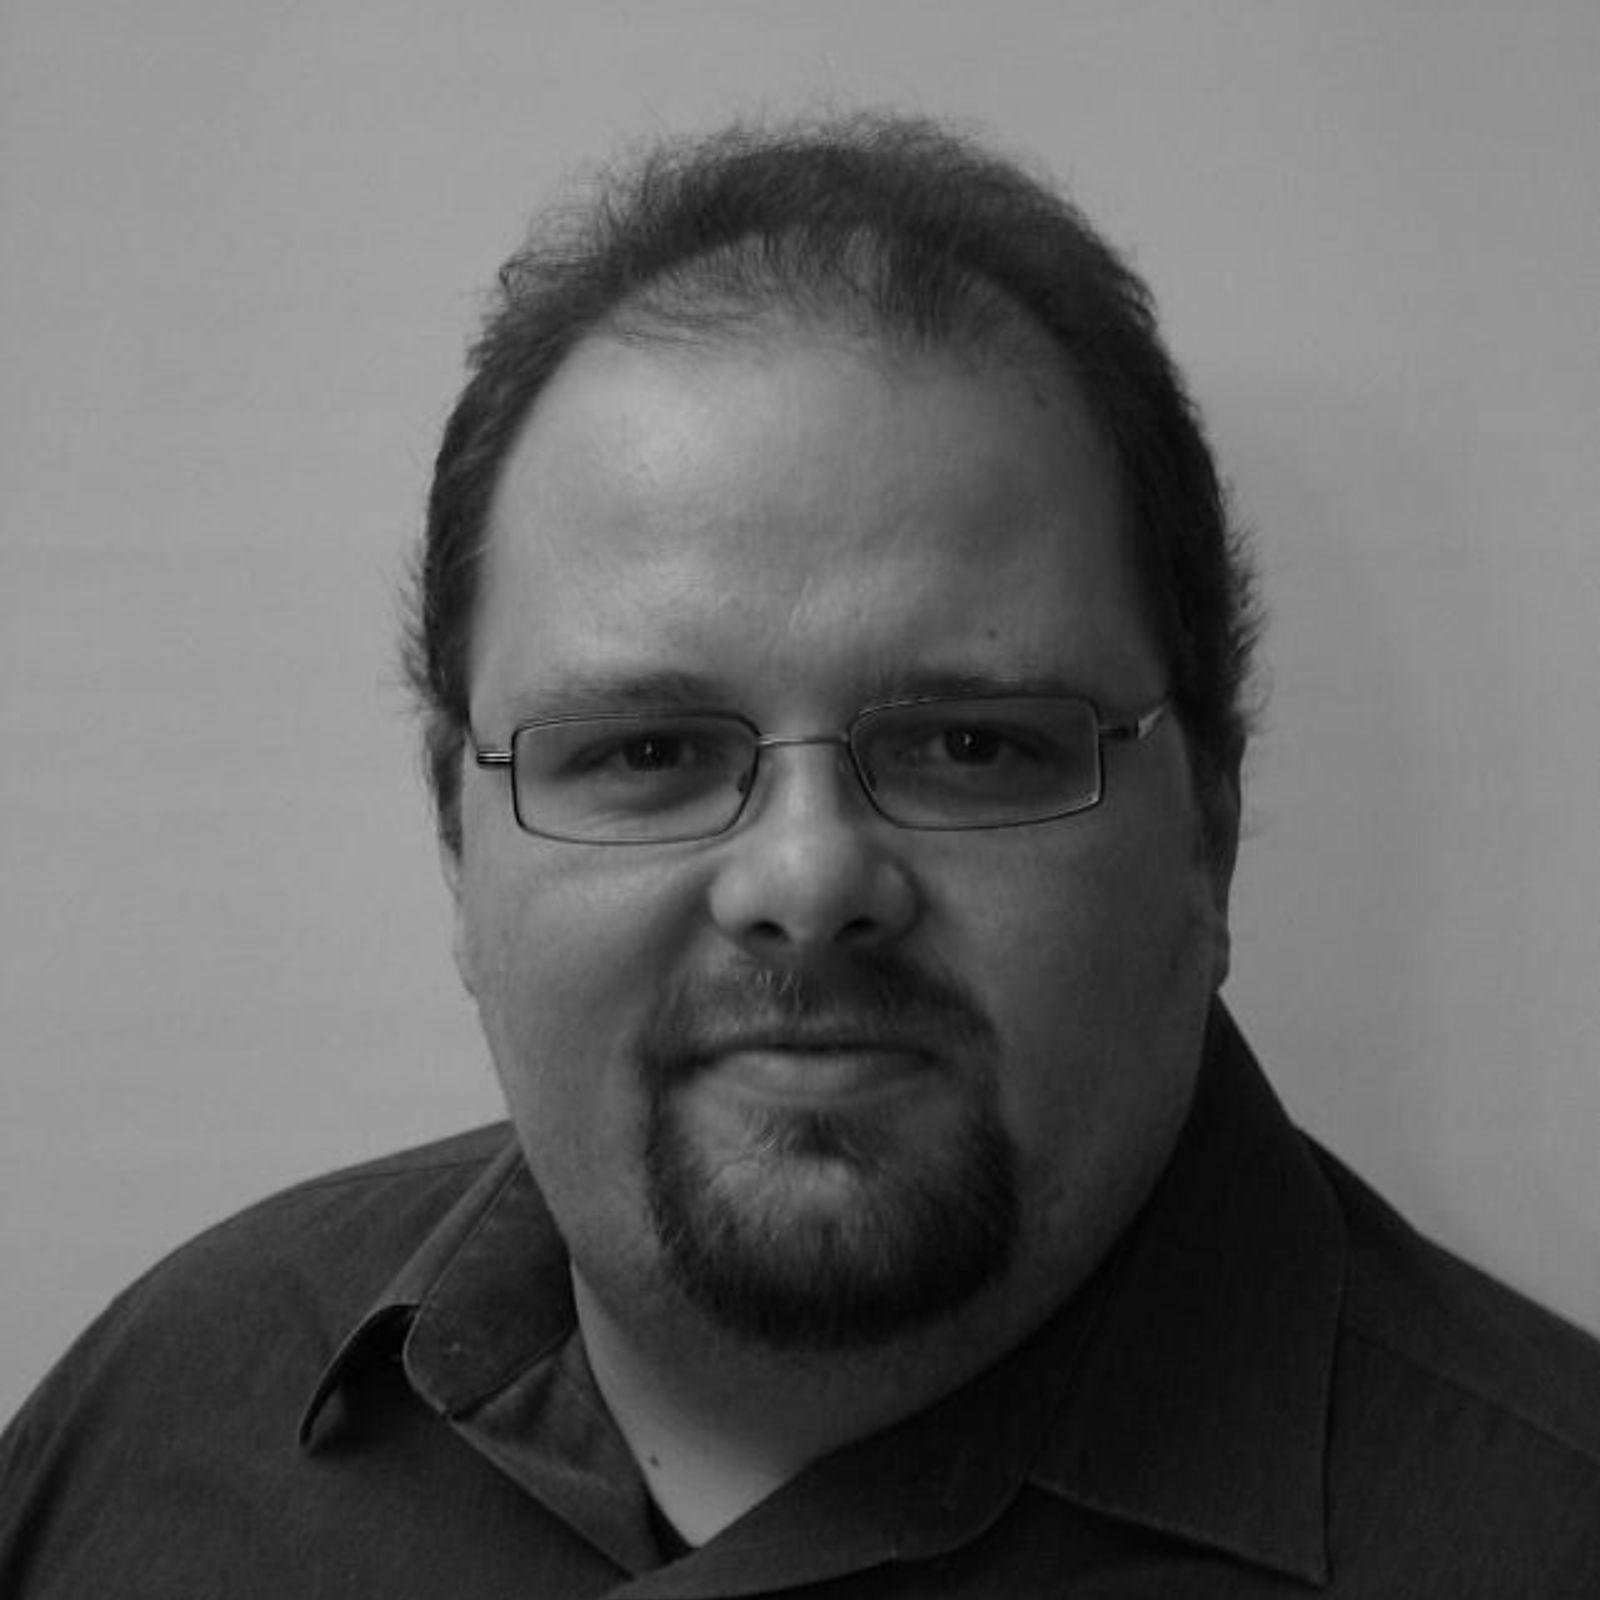 Portrait of Jens Bendisposto